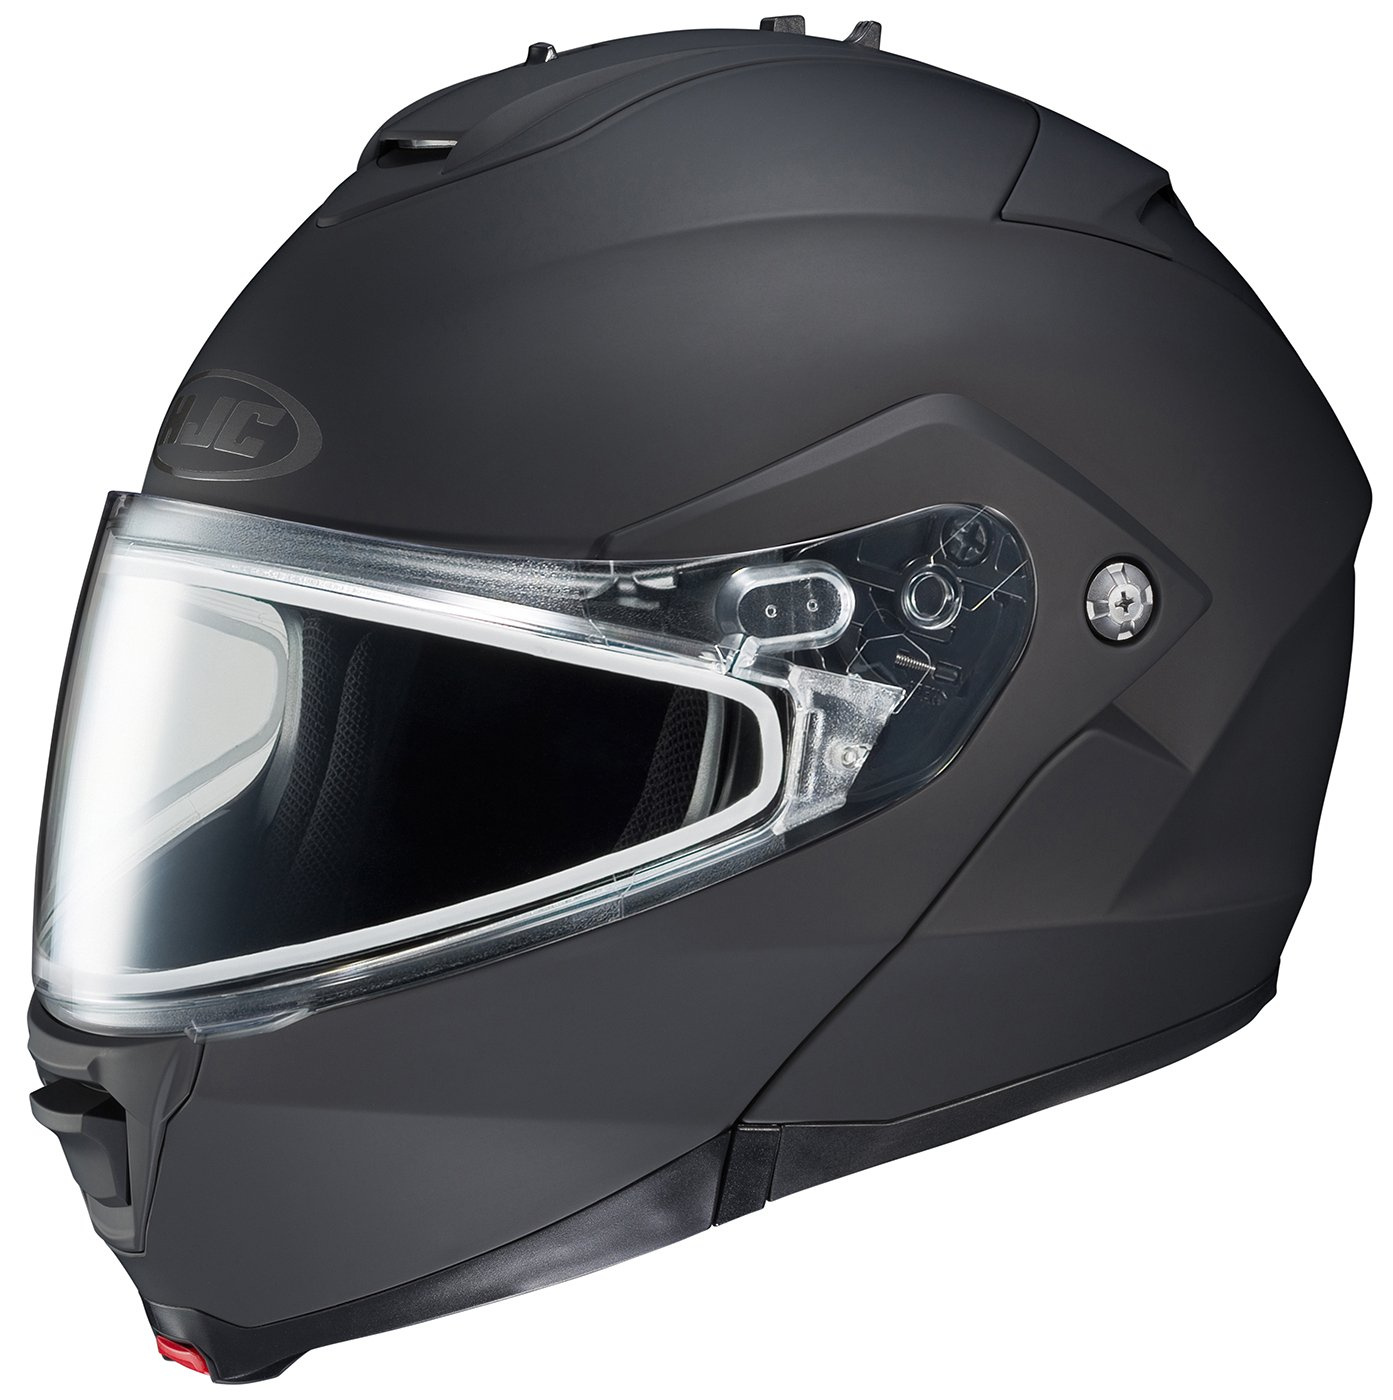 HJC IS-MAX2SN Modular Snow Helmet Frameless Dual Lens Shield (Matte Black, Small)